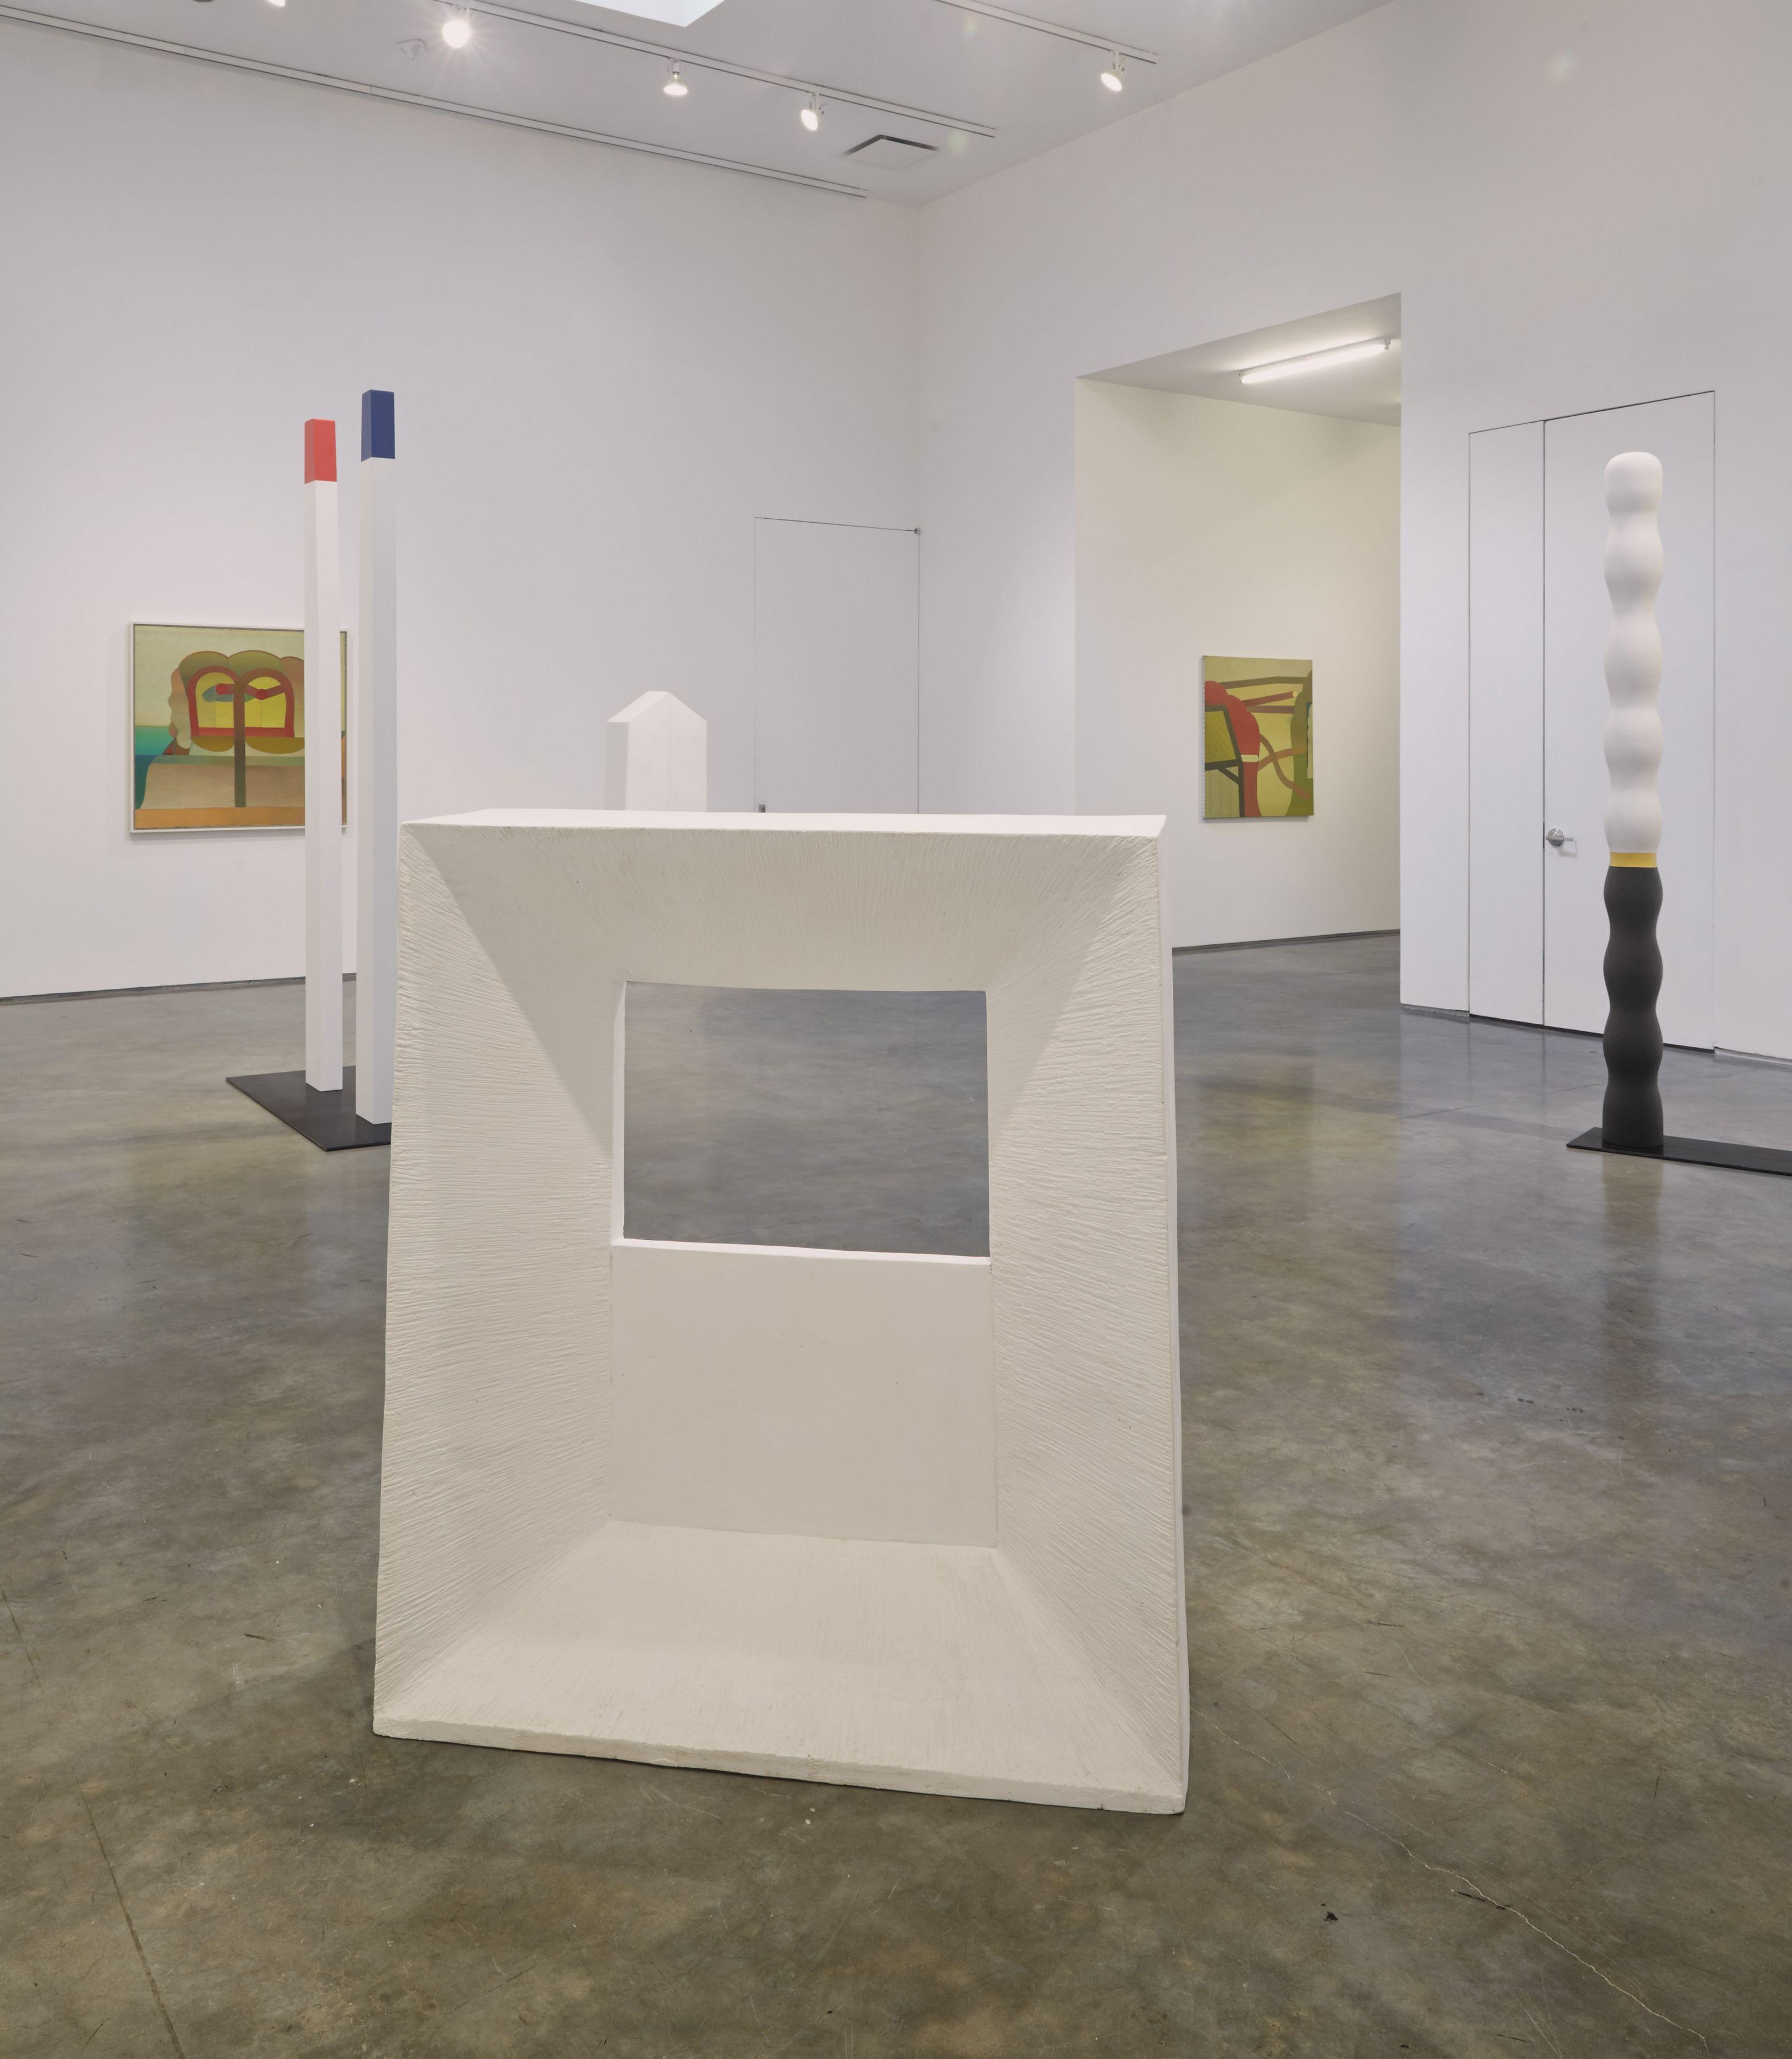 No Vacancies(Installation View), Marianne Boesky Gallery, 2015